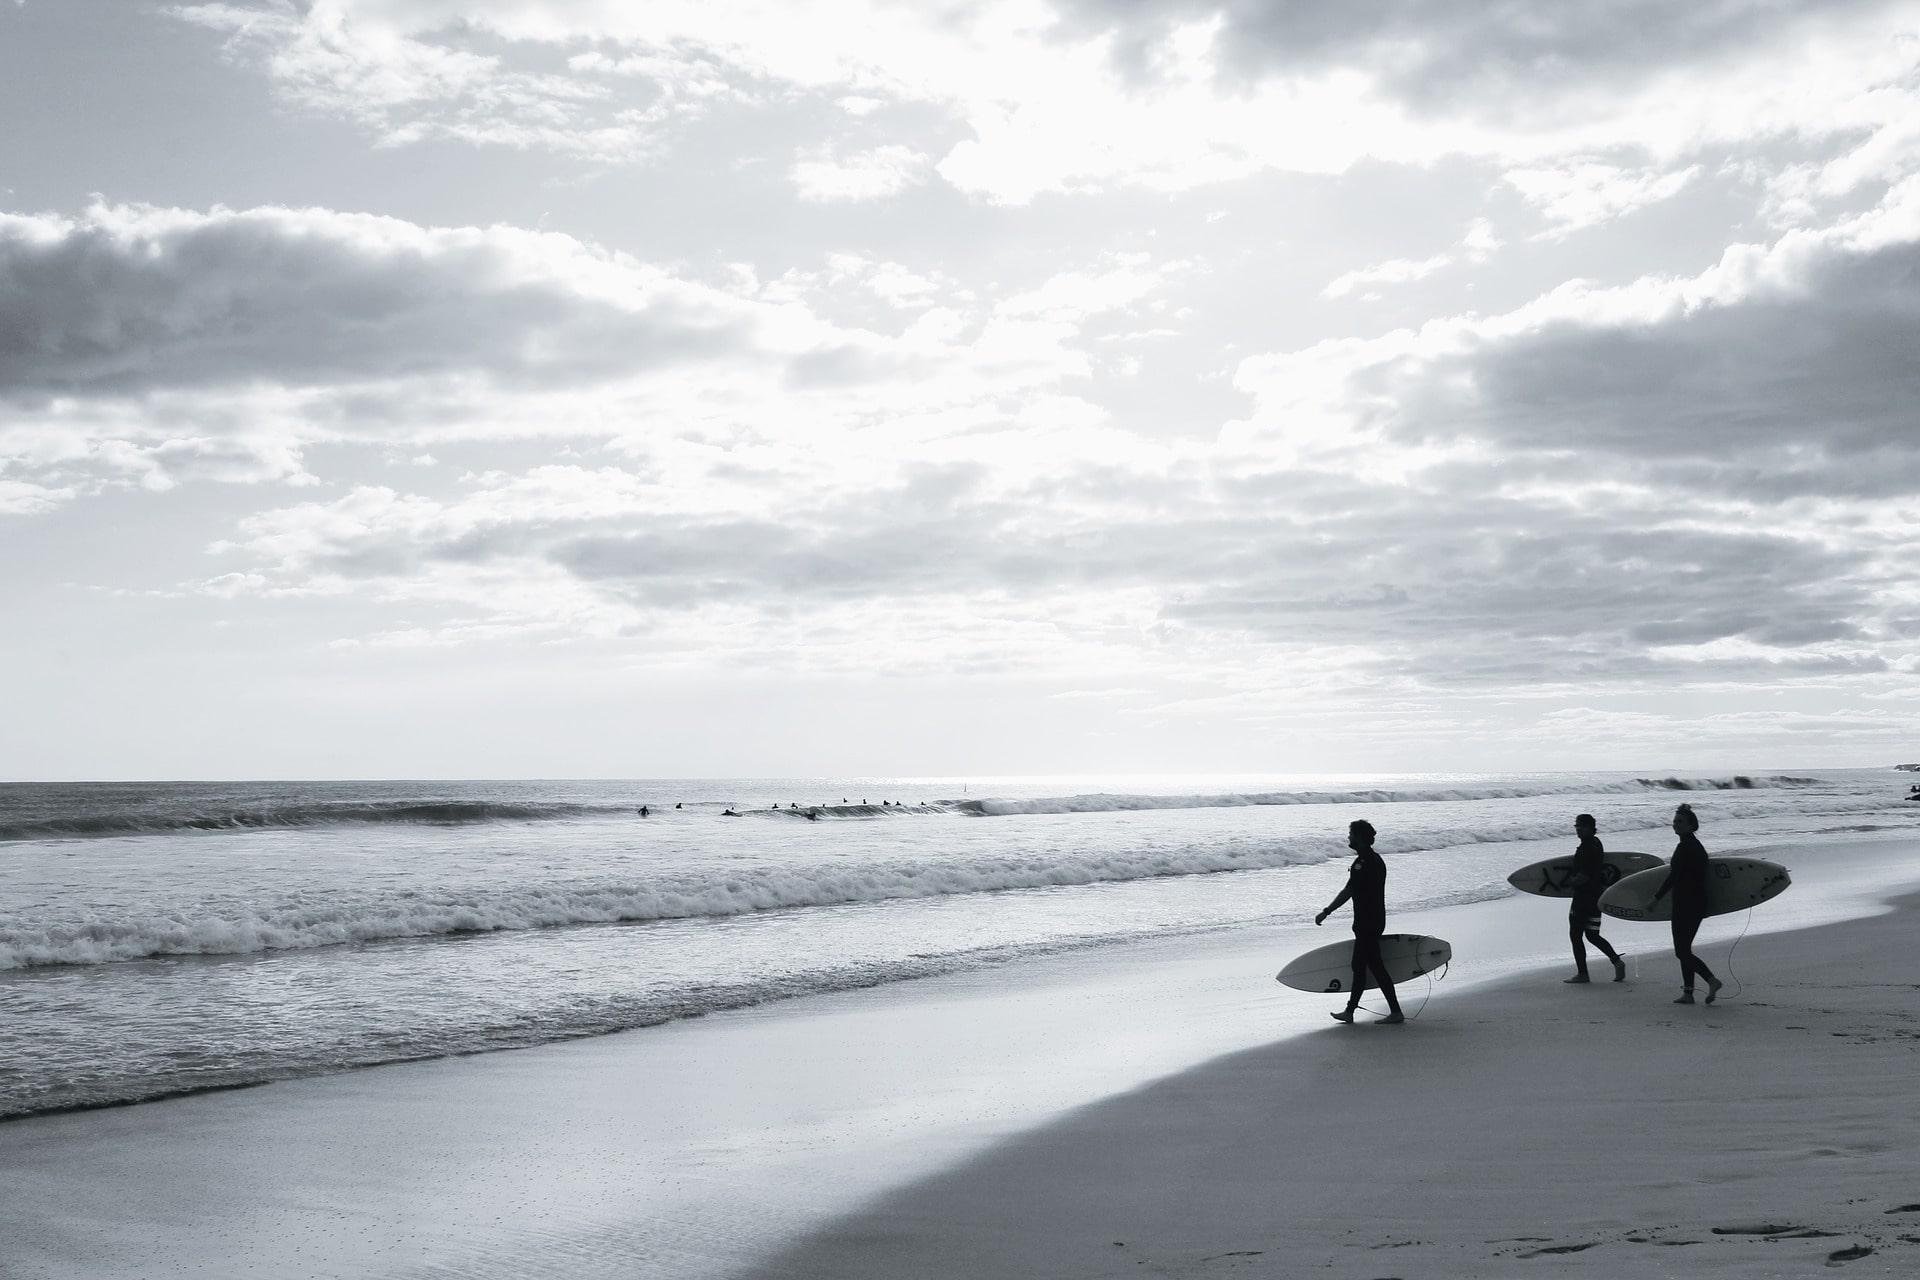 surf-863696_1920-min